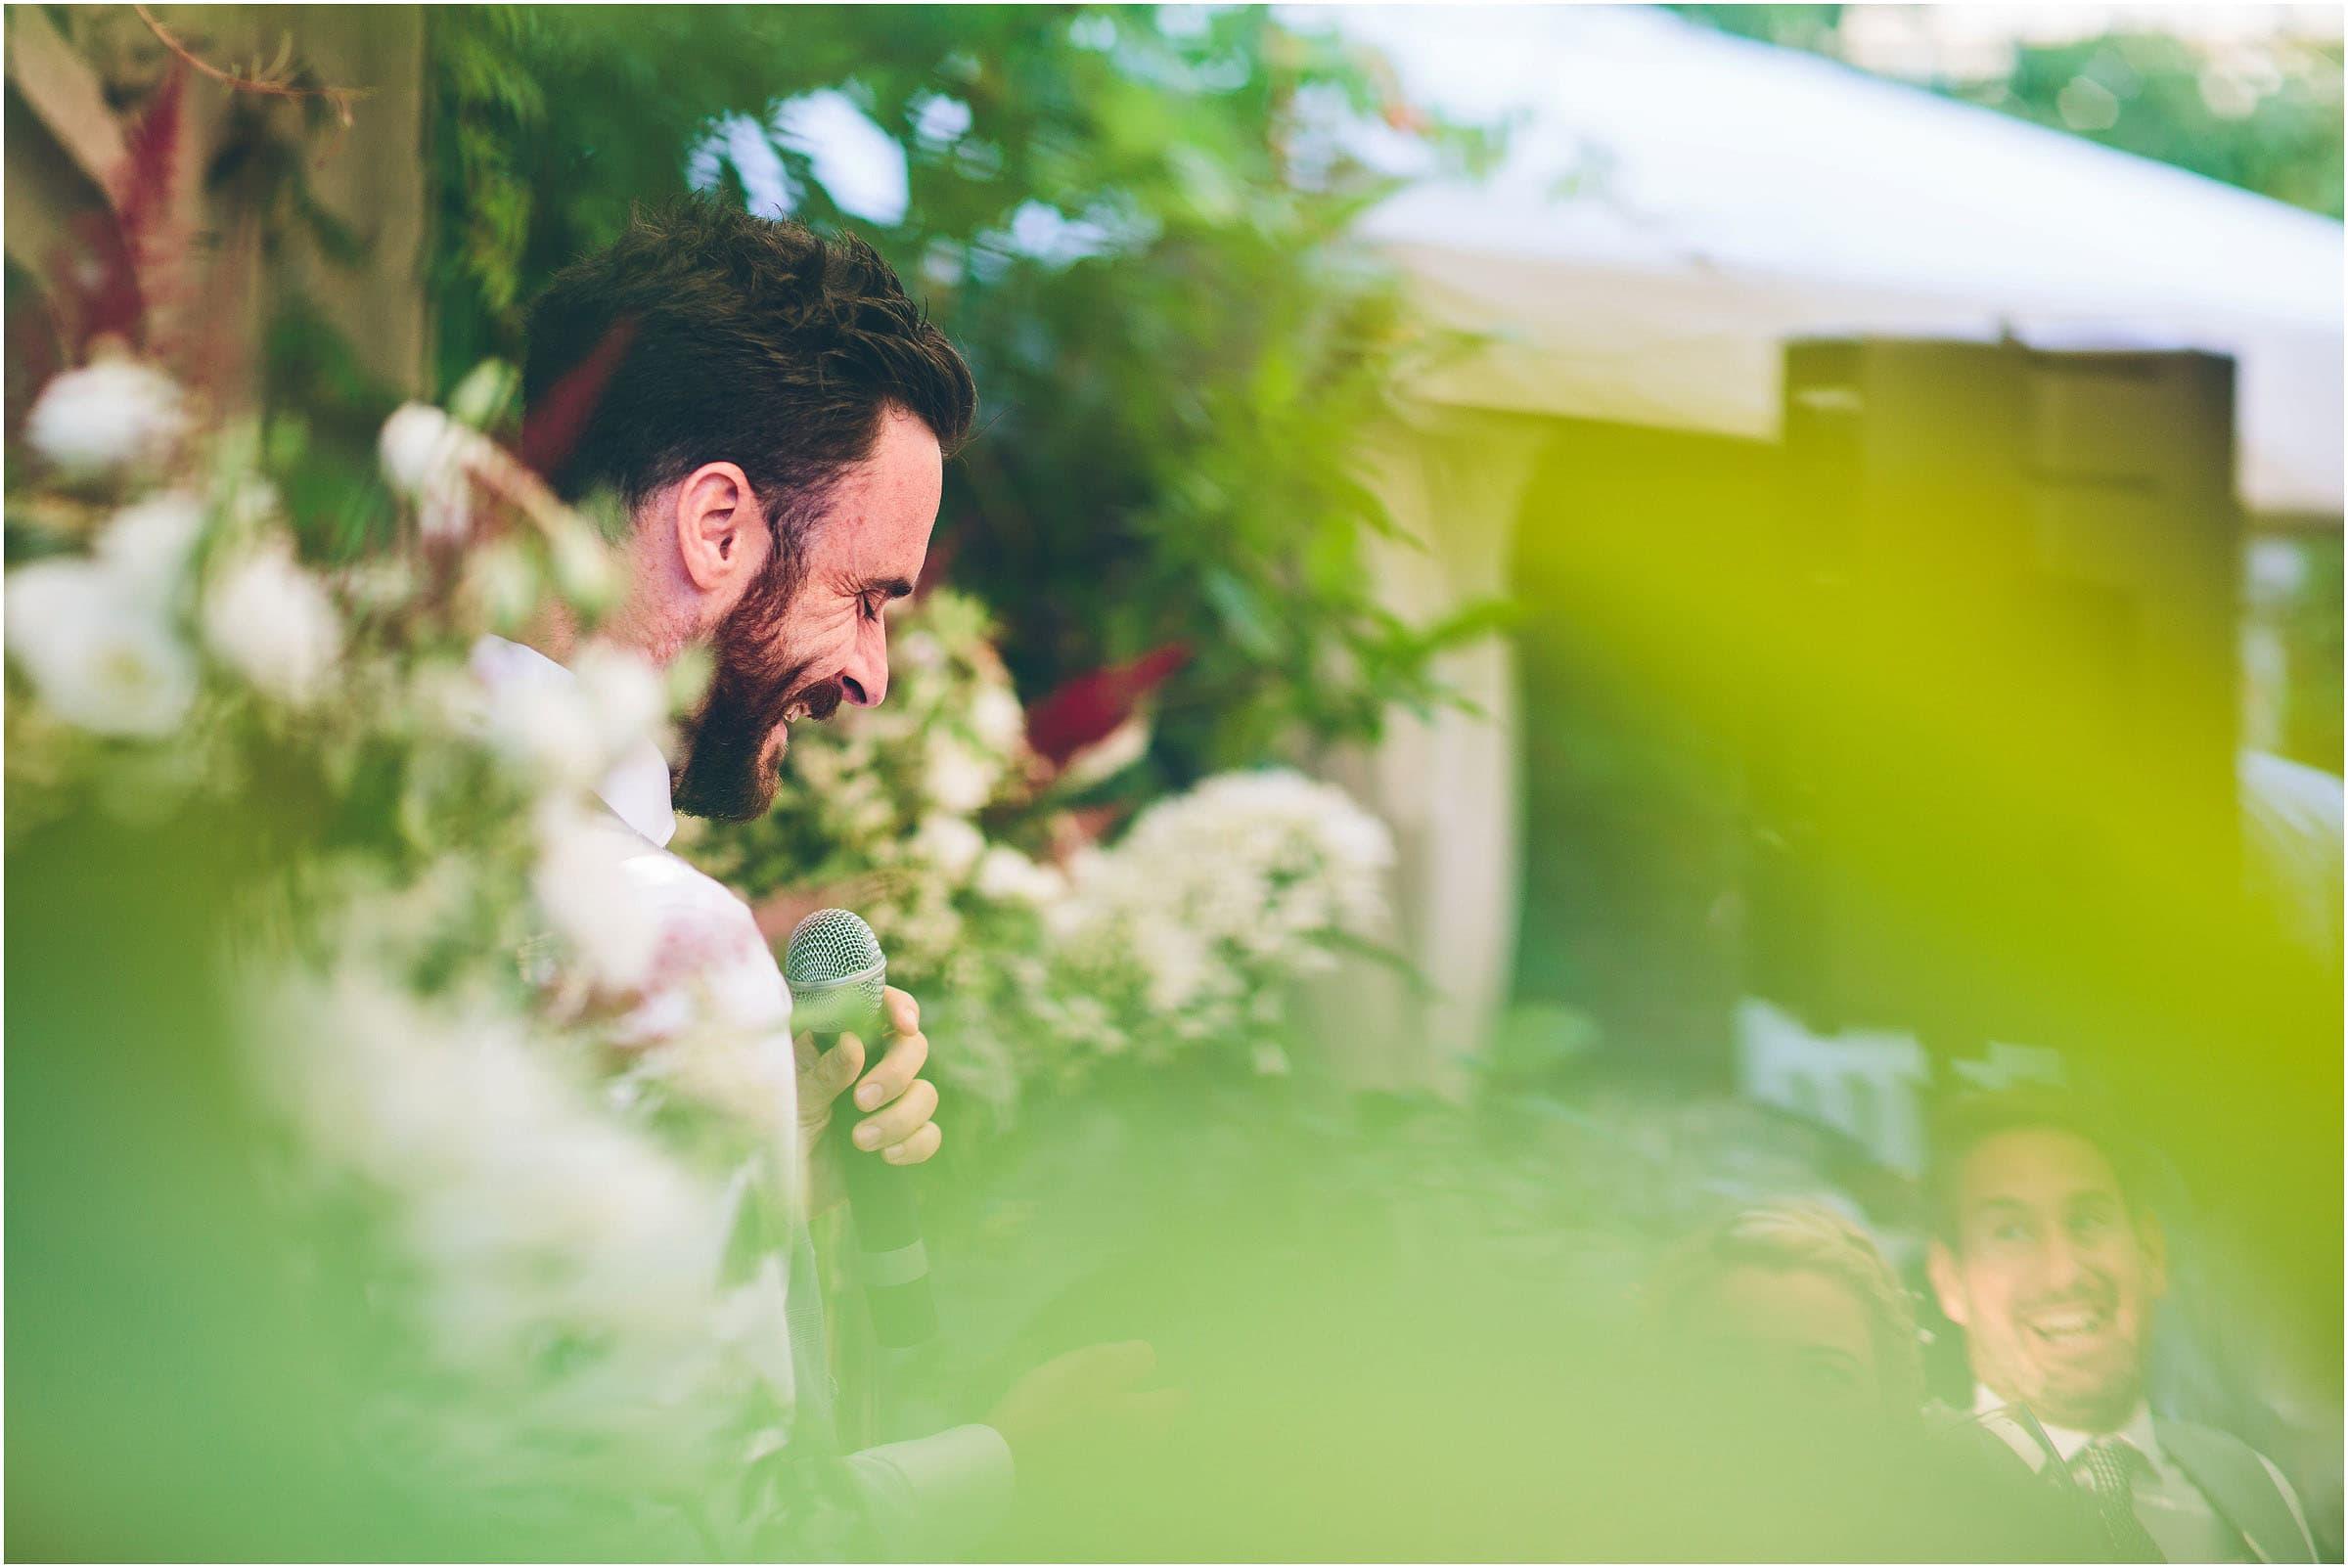 Kensington_Roof_Gardens_Wedding_Photography_0105